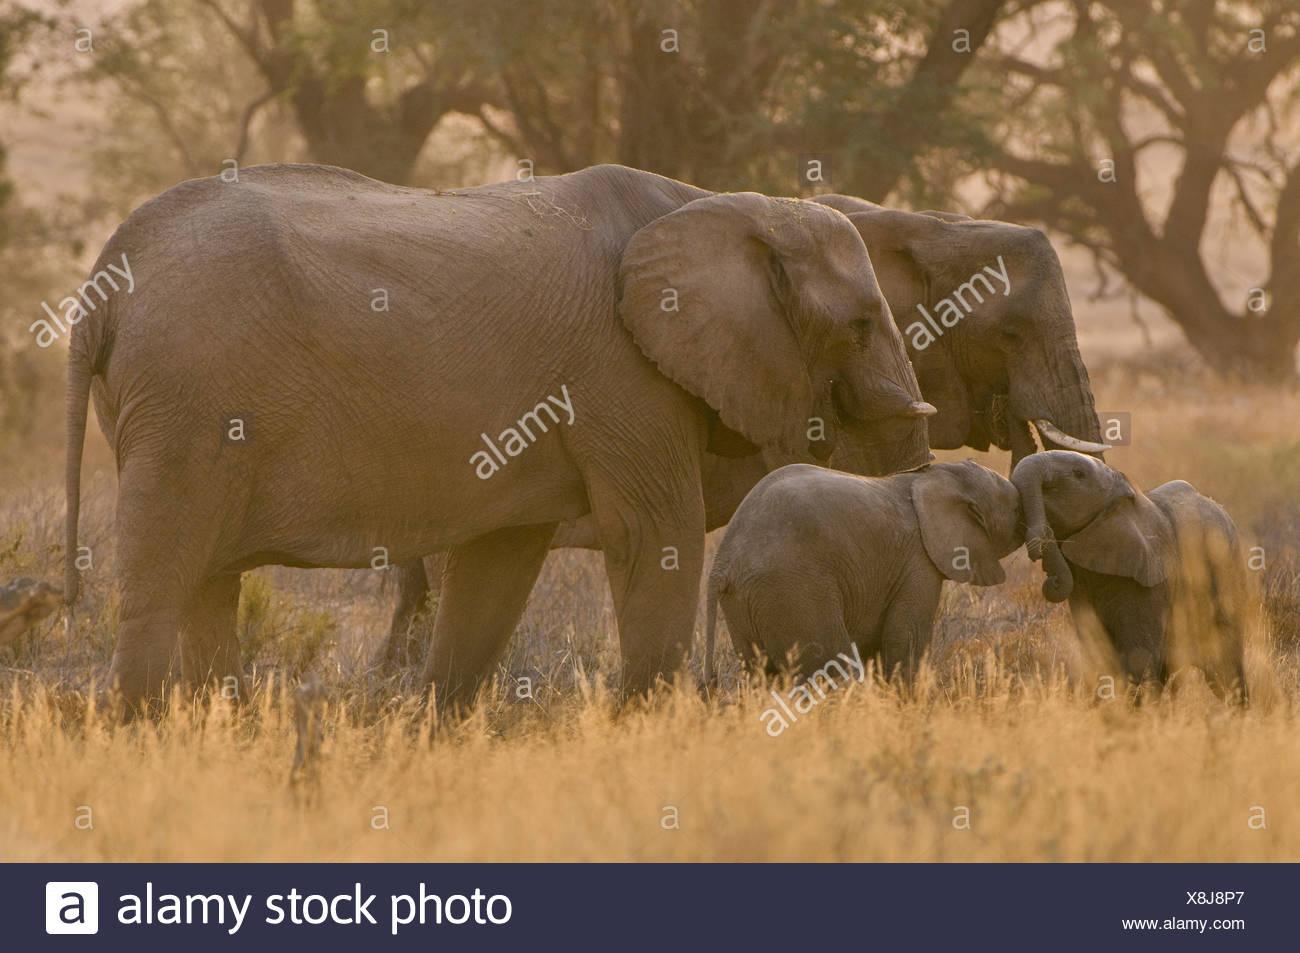 Desert elephant family Loxodonta africana Huab River Torra Conservancy Damaraland Namibia wildlife - Stock Image